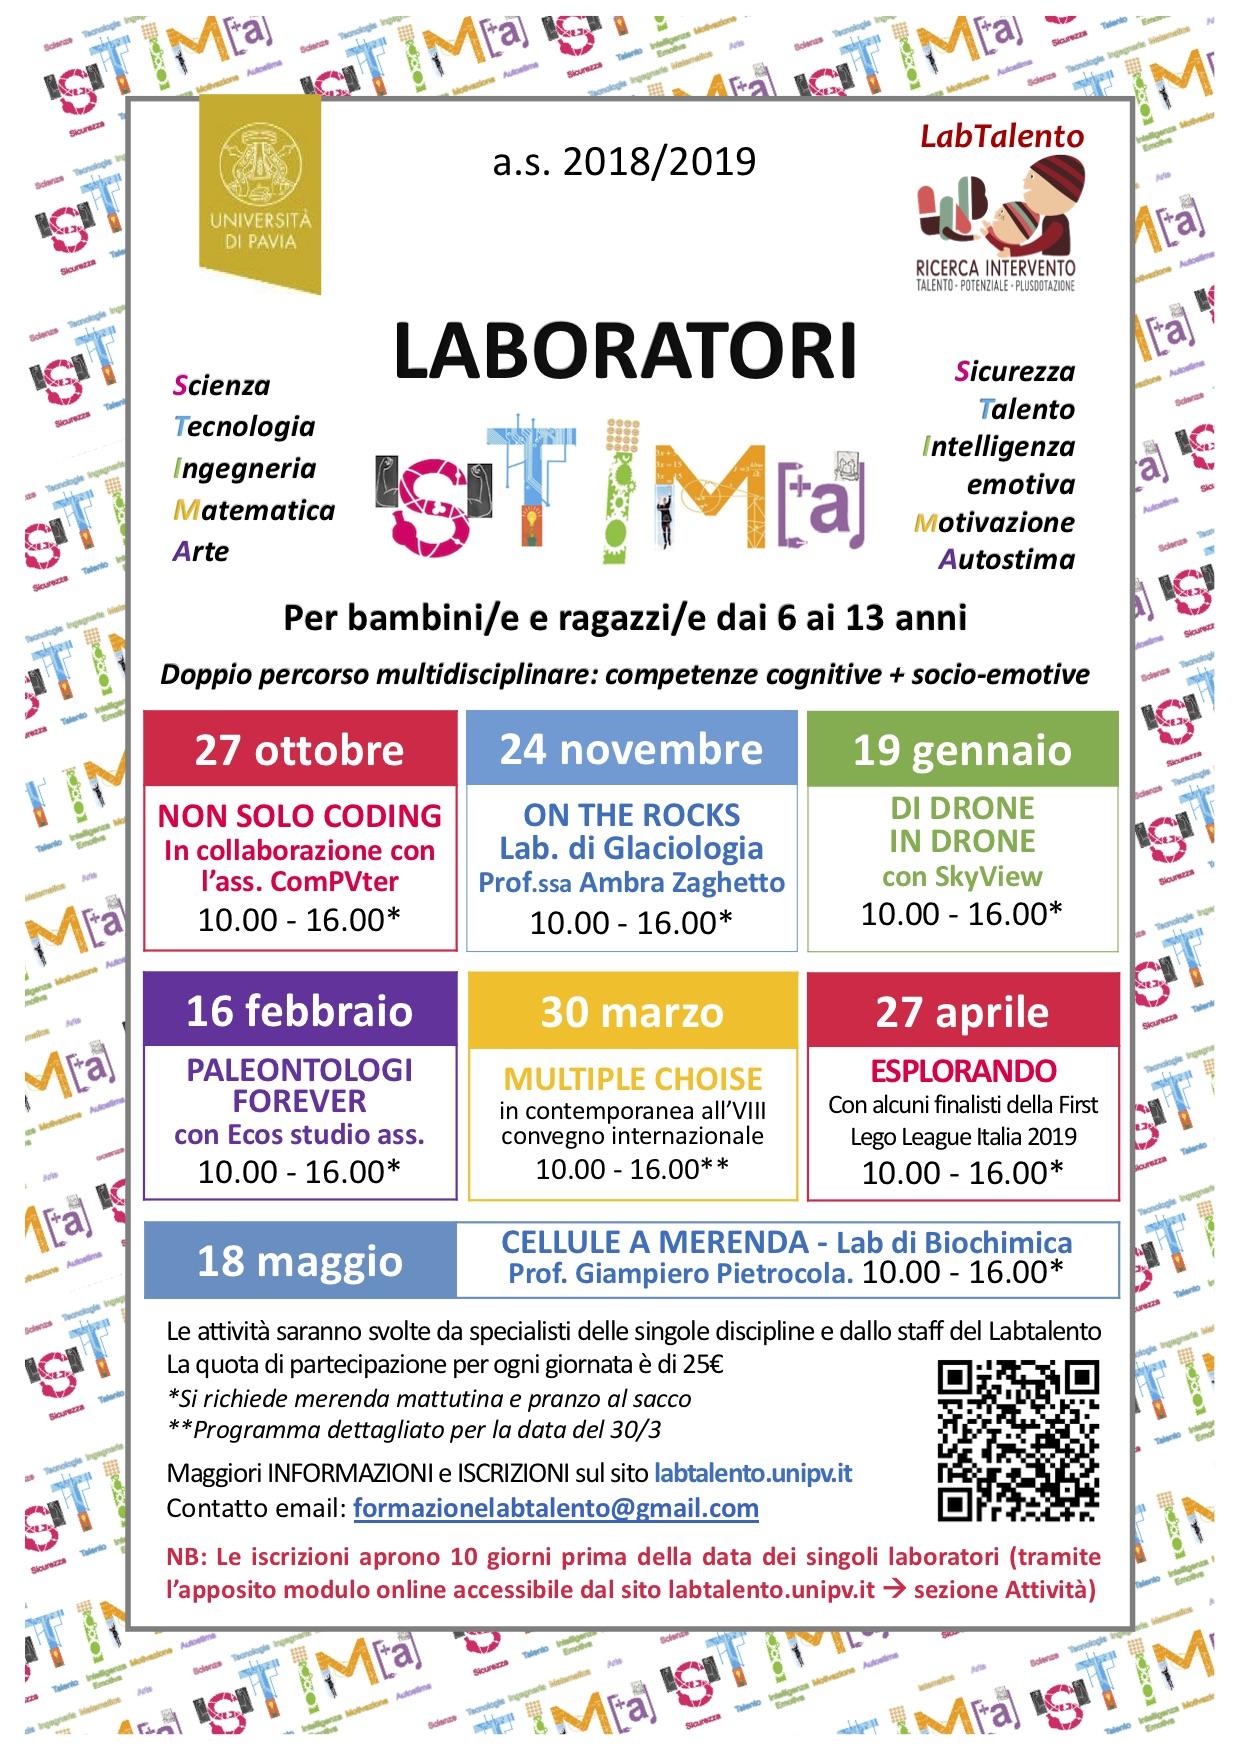 Locandina Laboratori STIMA as2018-2019def